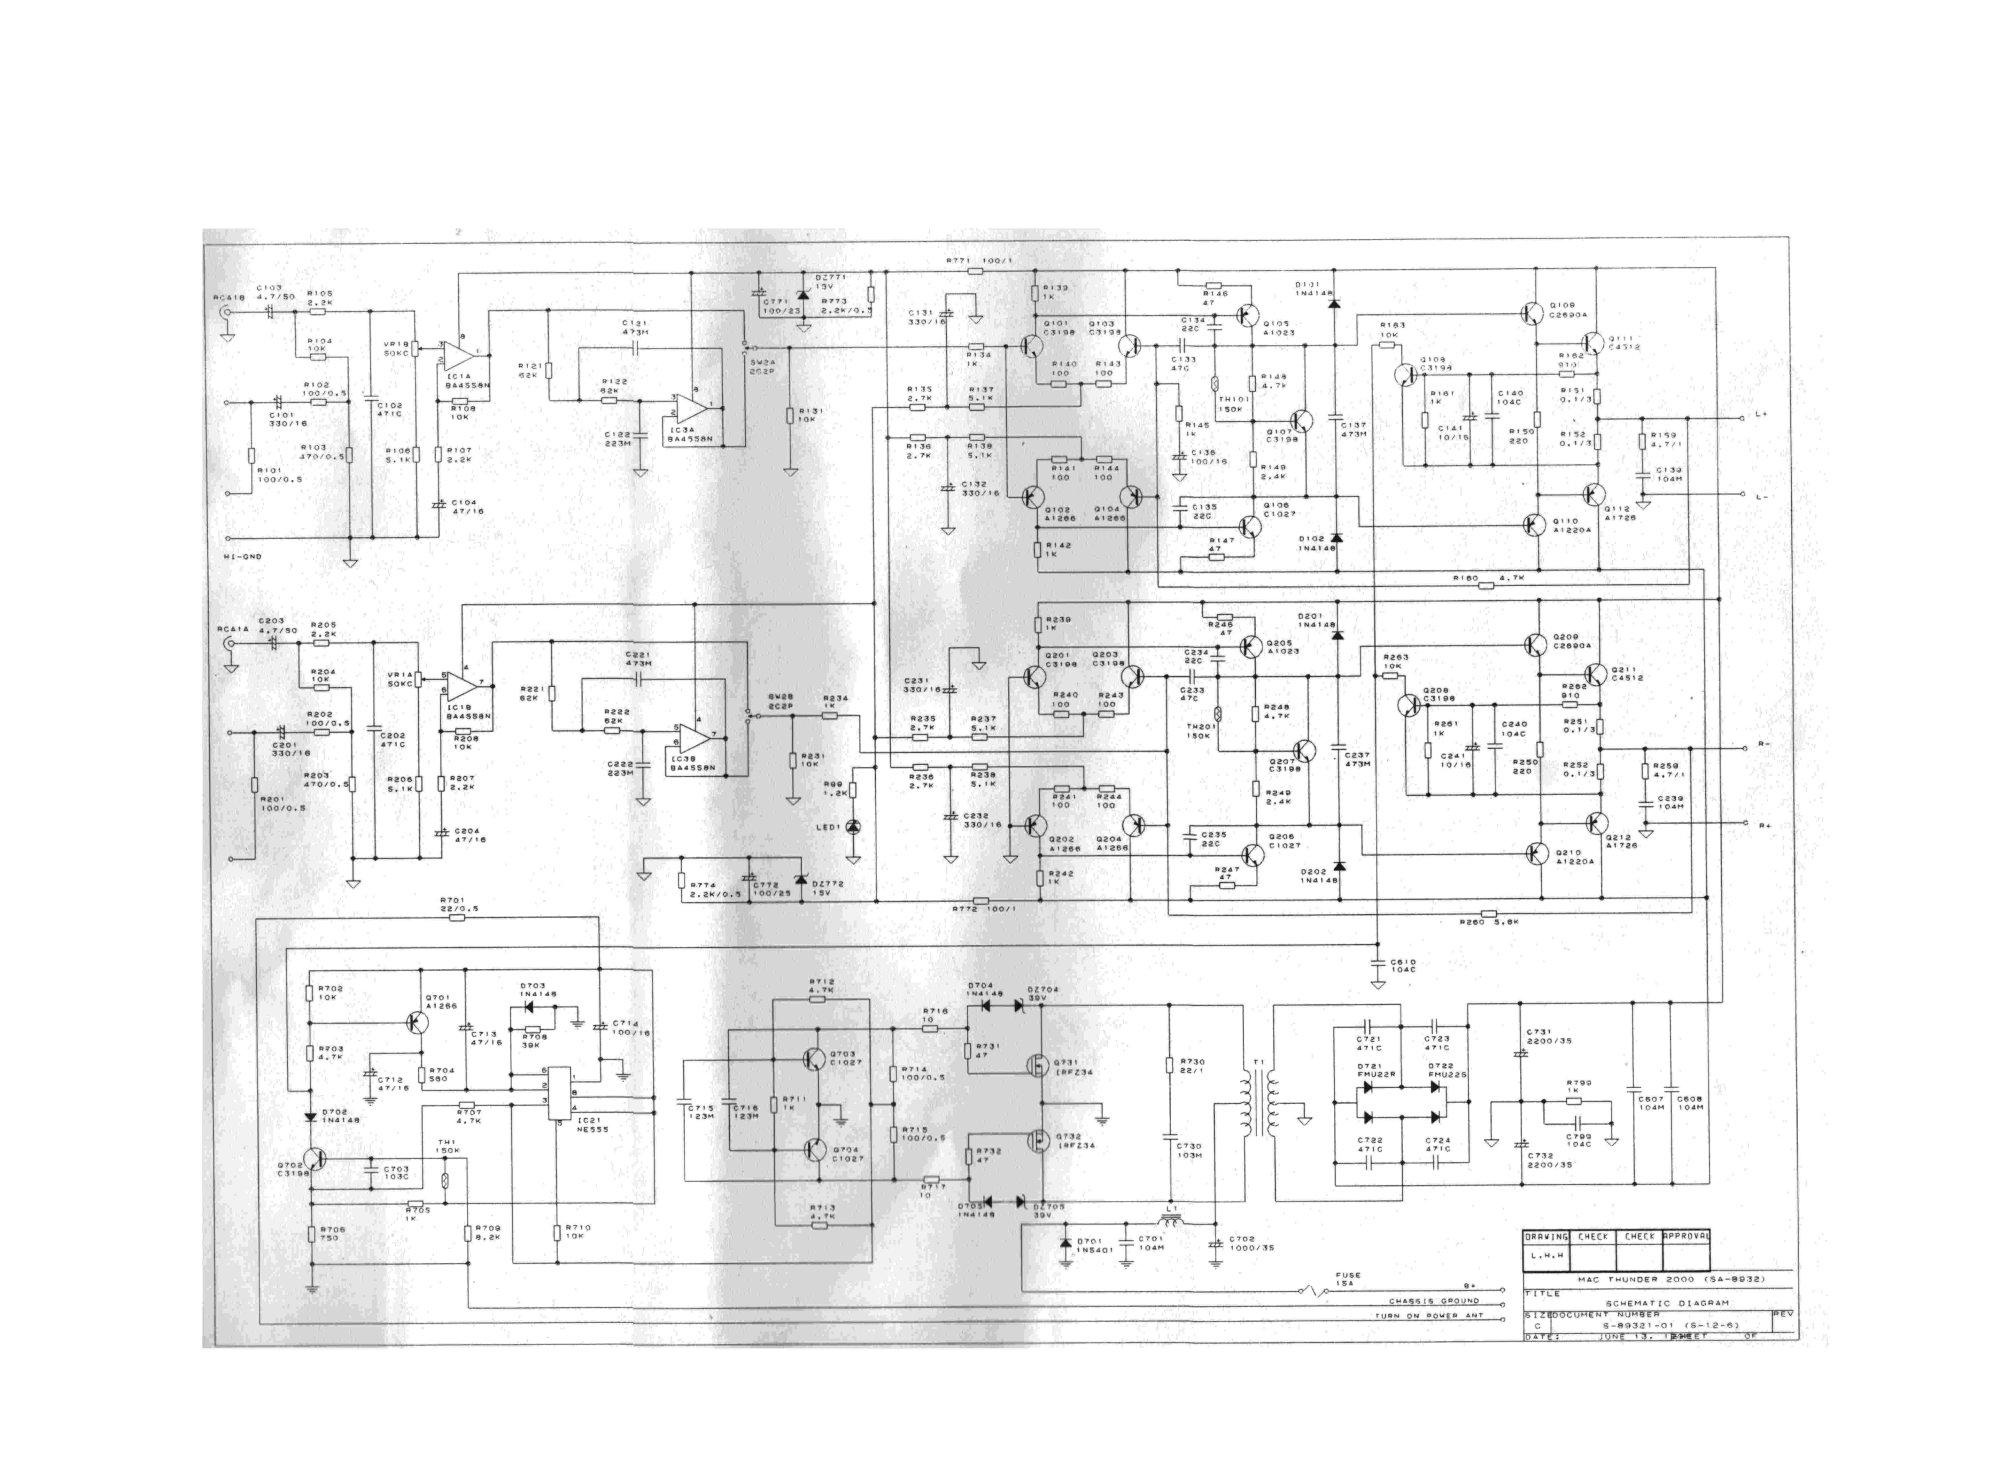 5w Os Csves Vgfok 80w Audio Amplifier Based On Tda7295 Circuit Diagram Lm12